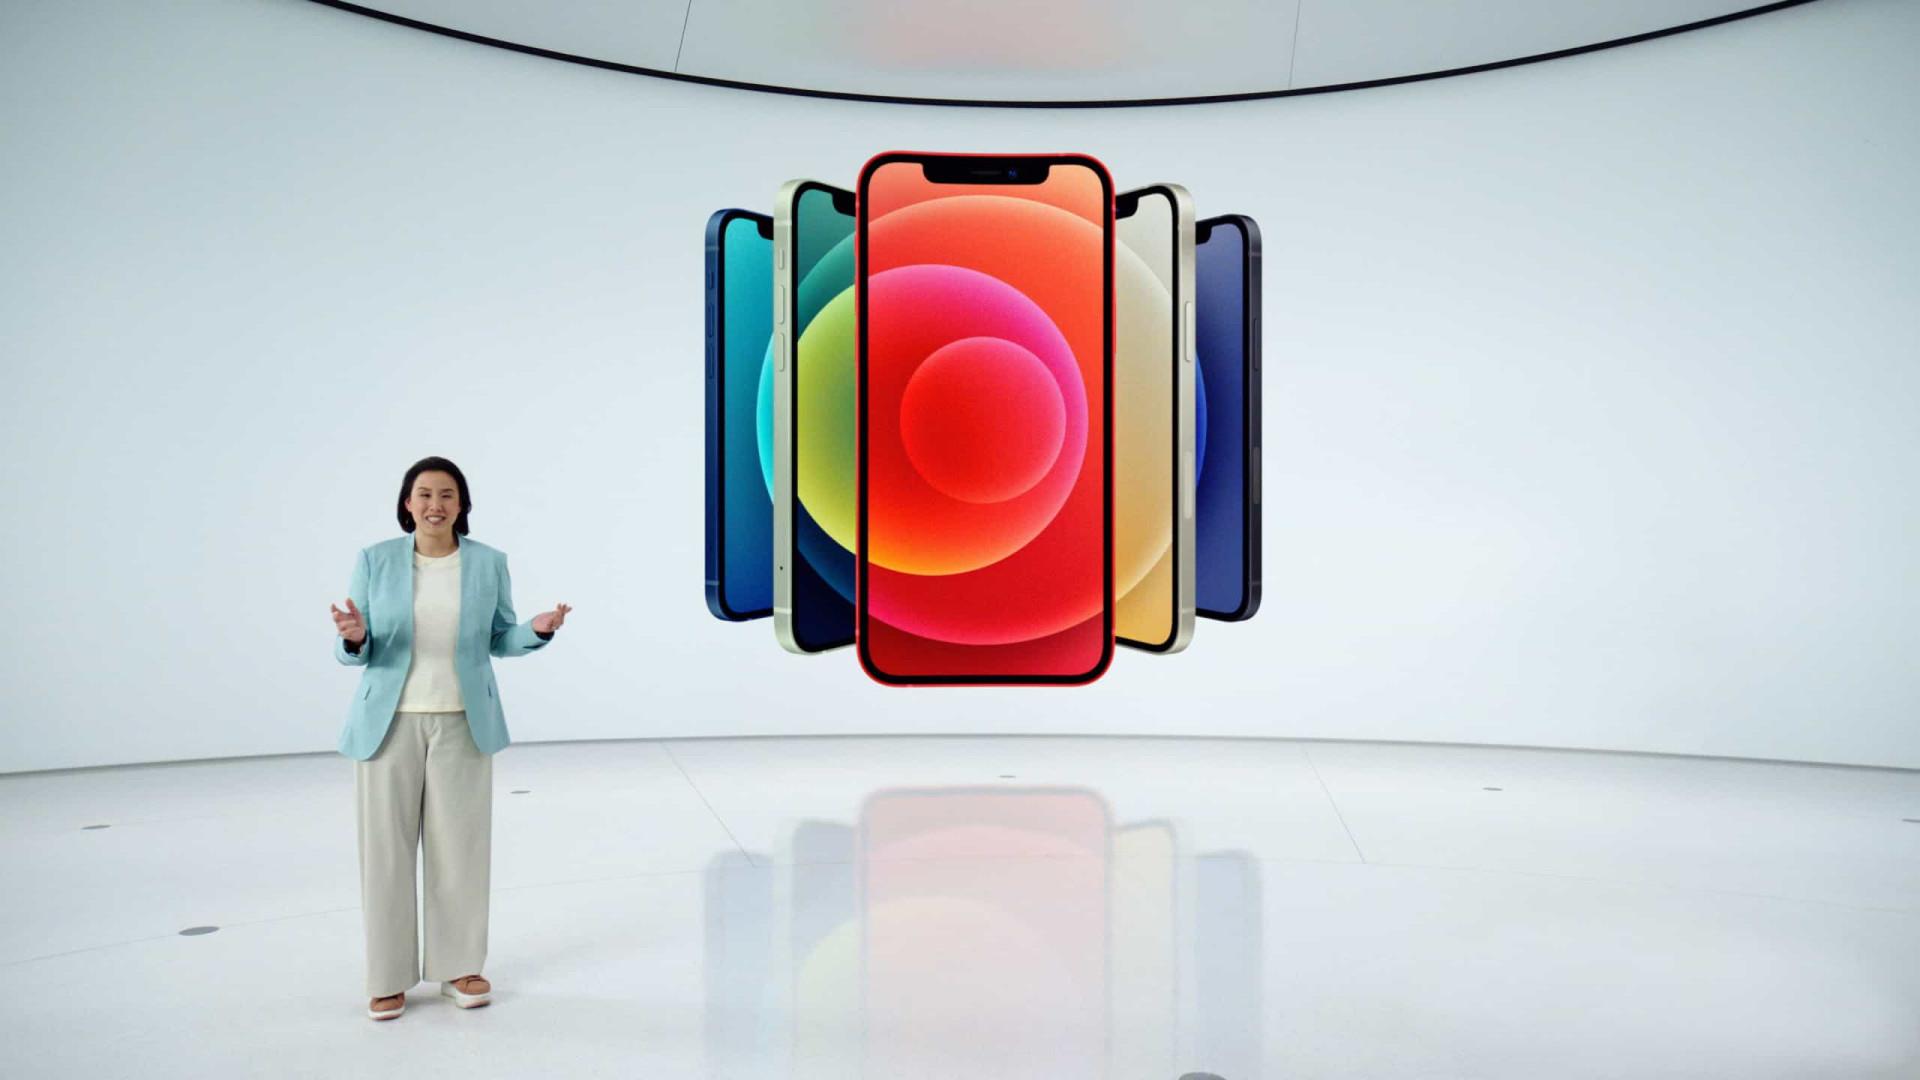 iPhone 12. Vale a pena comprar o novo telemóvel da Apple?